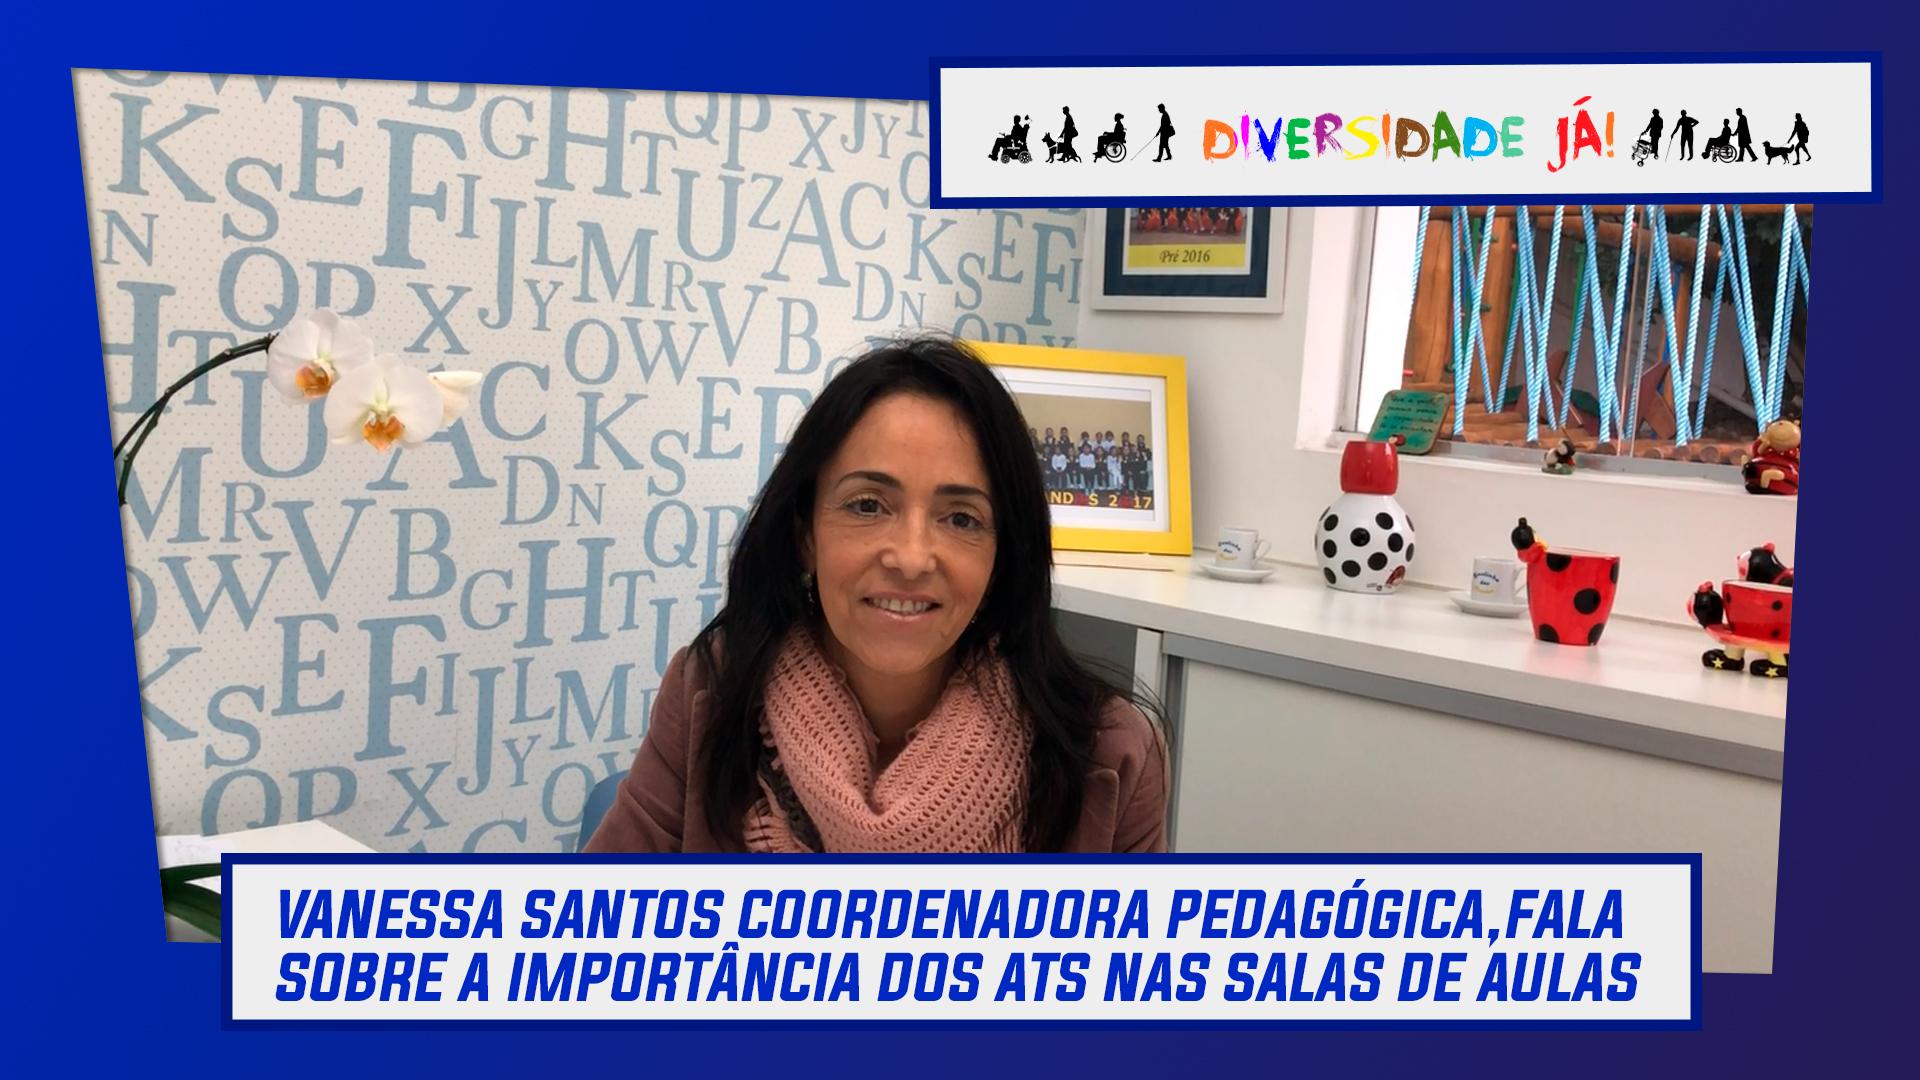 Vanessa Santos coordenadora pedagógica,fala sobre a importância dos ATs nas salas de aulas